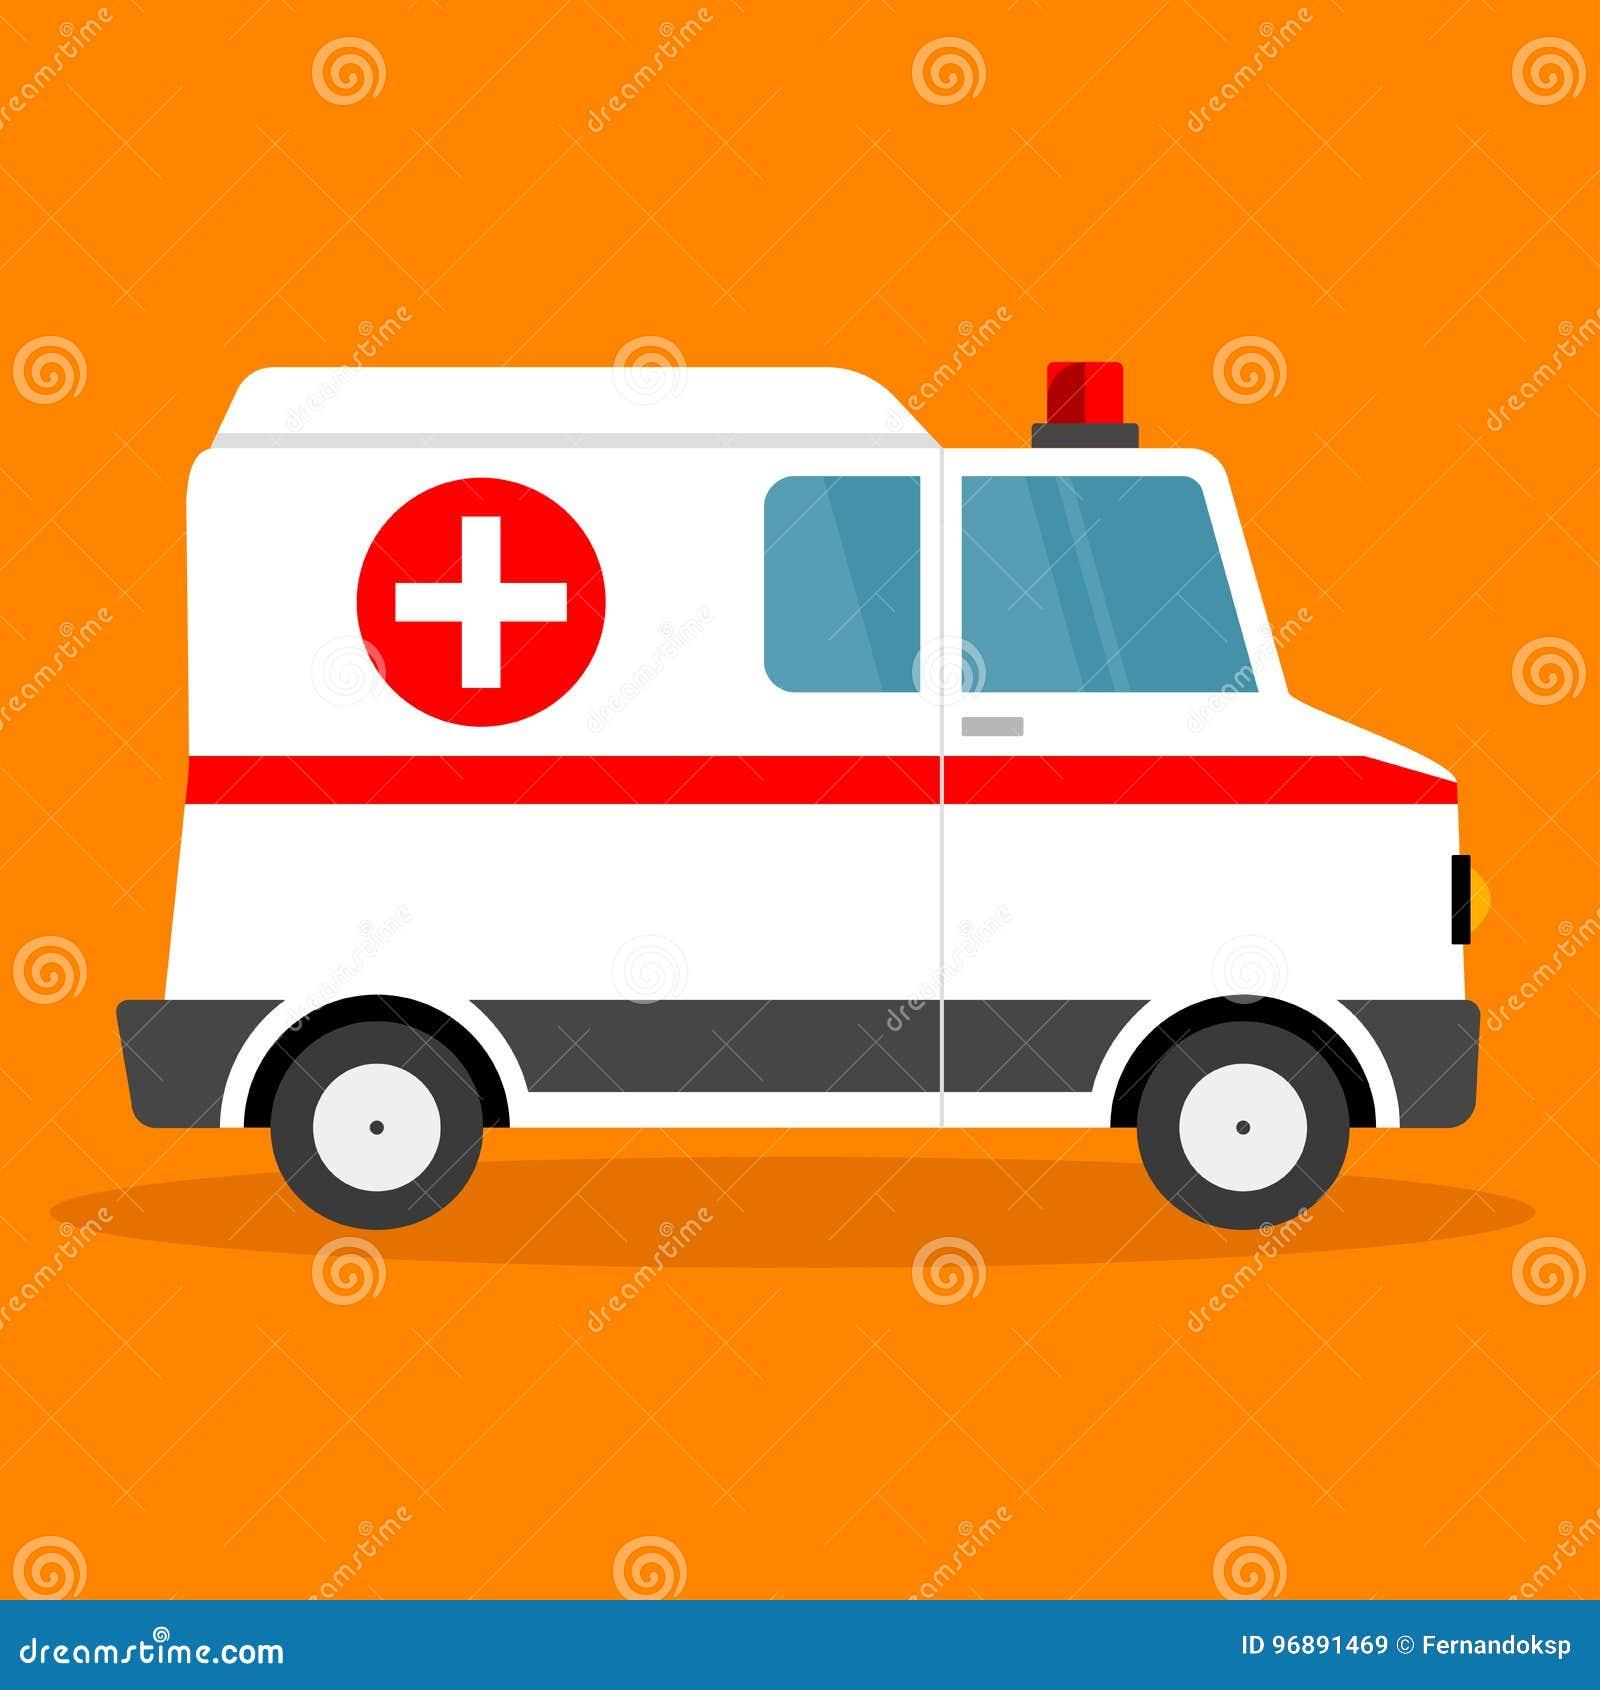 Vector illustration ambulance car